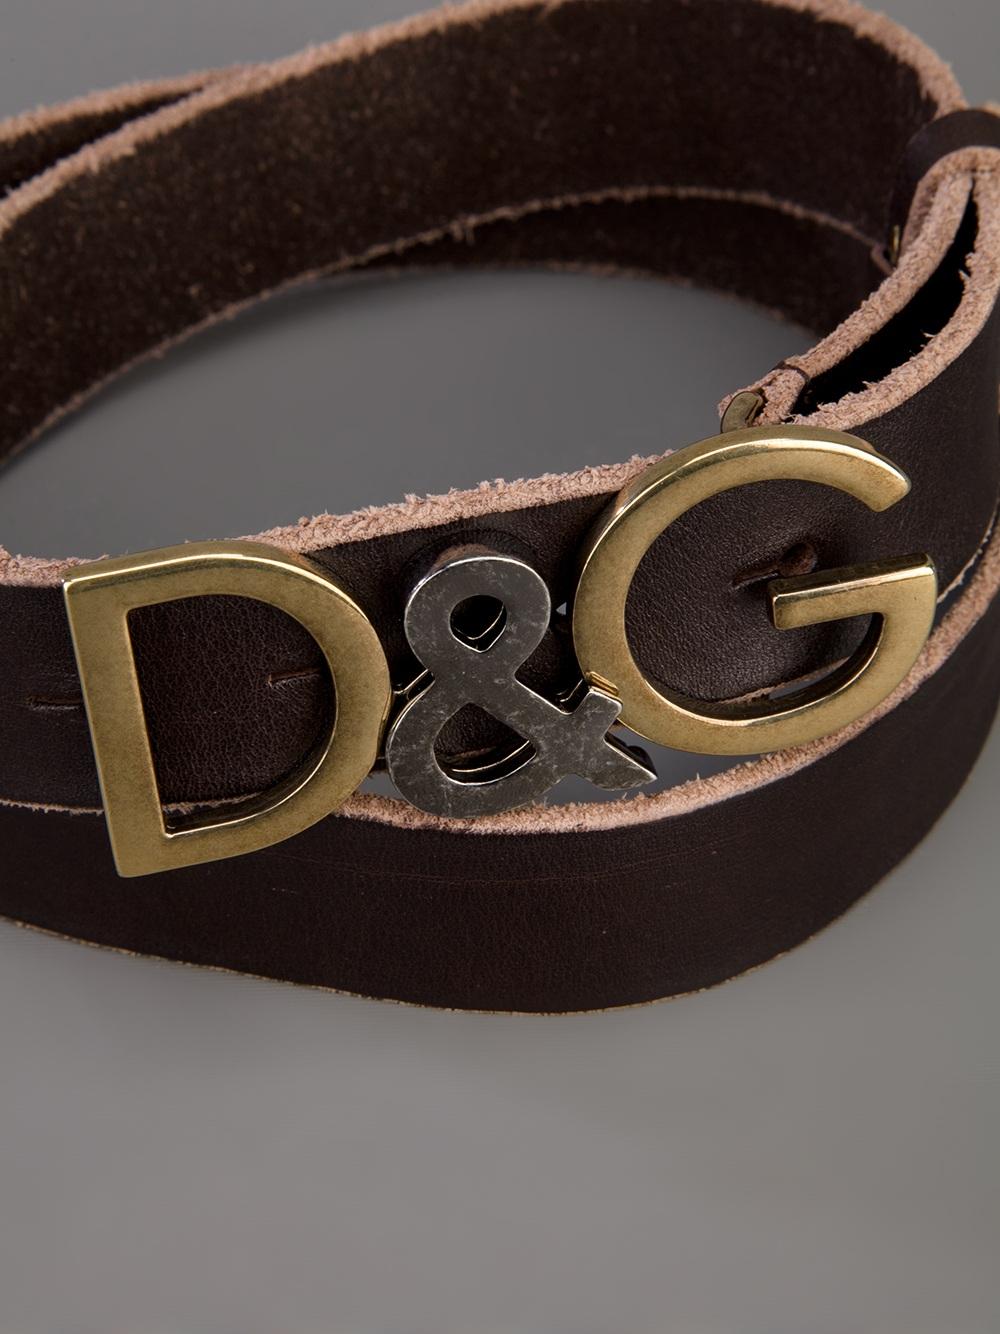 88d5b7c54c ... wholesale lyst dolce gabbana logo belt in brown for men 3463c 043b9